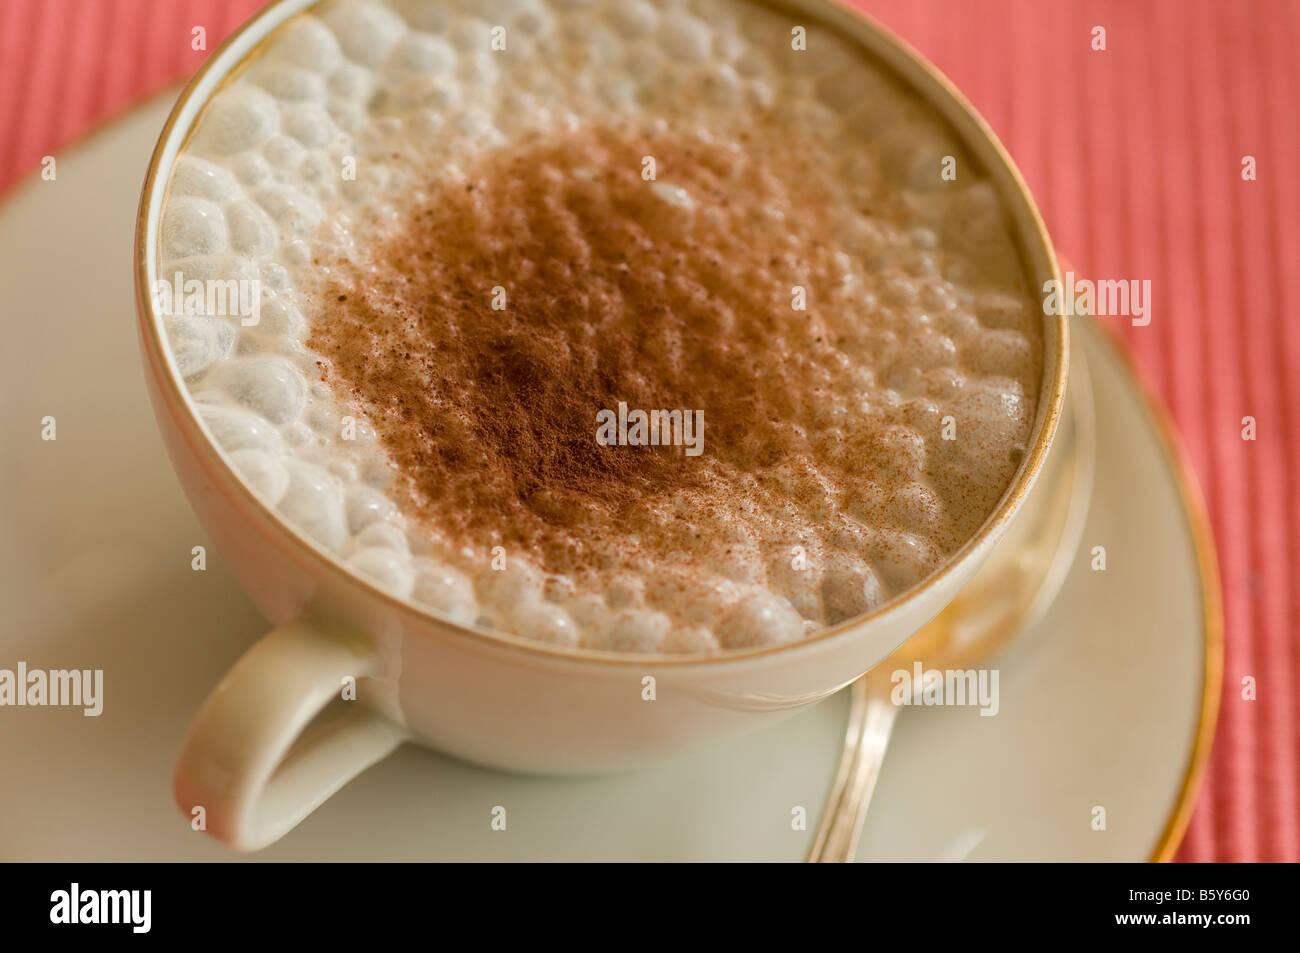 Cappuccino - Stock Image